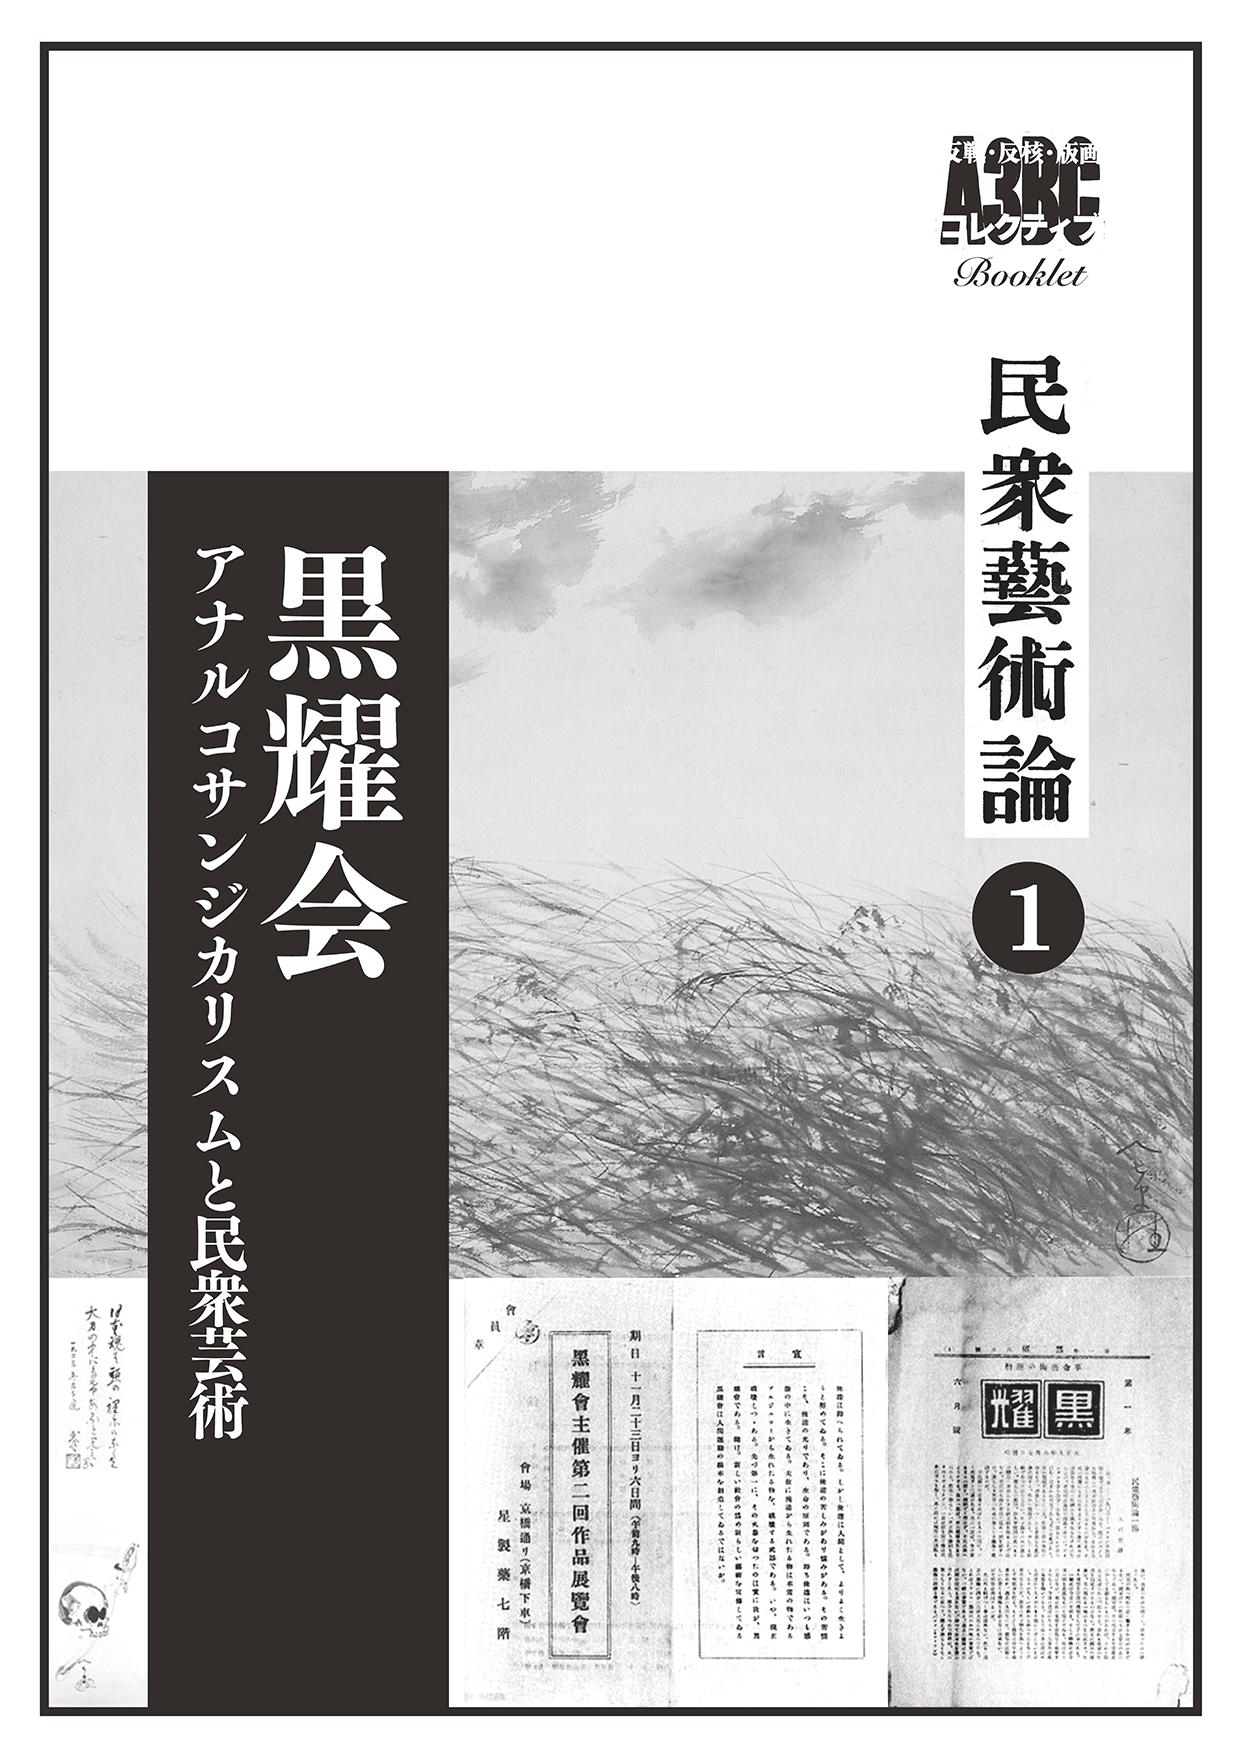 『A3BCブックレット』プロジェクト始動!